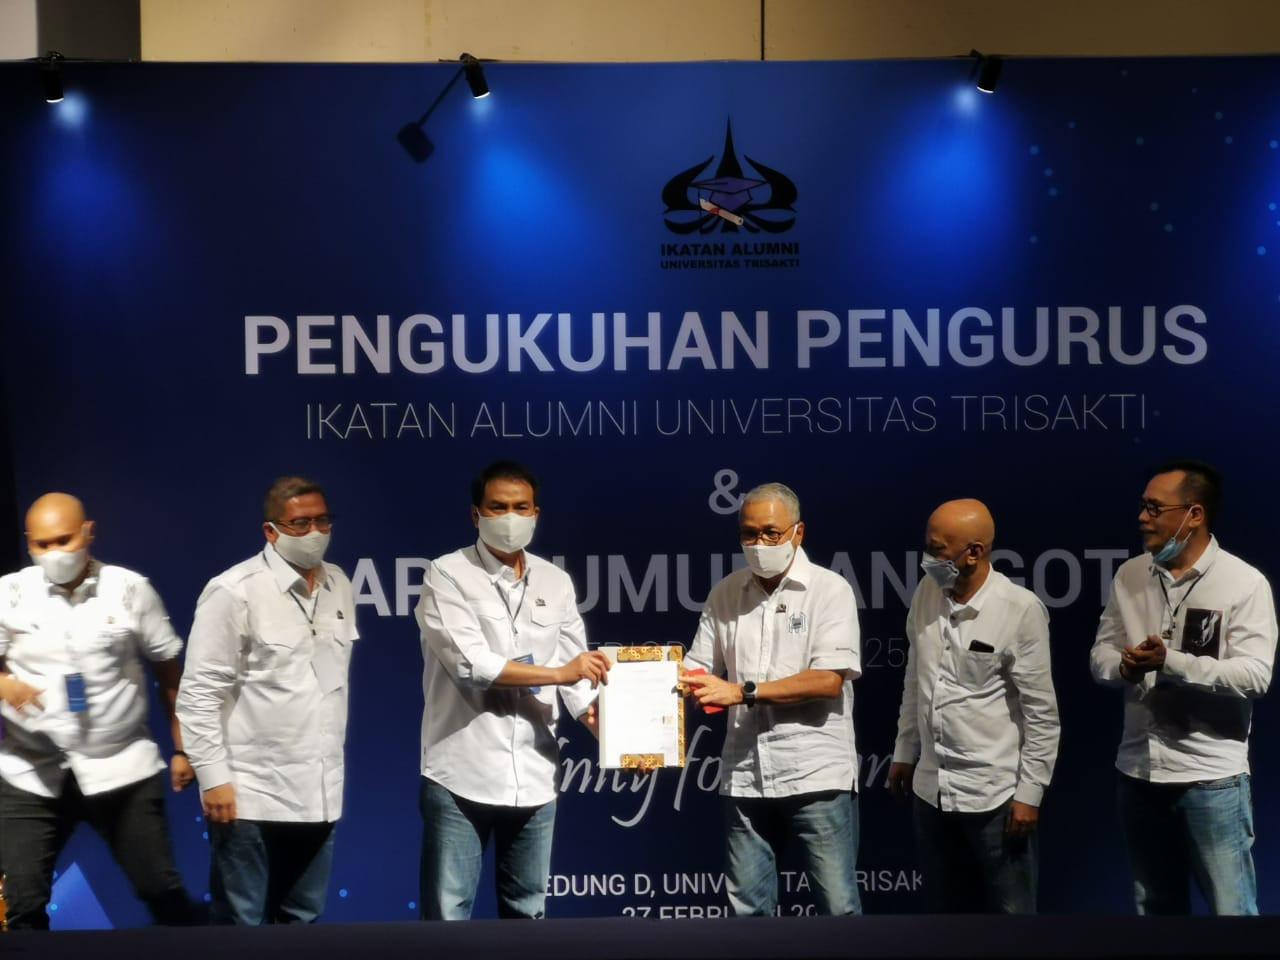 Azis Optimistis Menyatukan Pandangan Alumni Trisakti demi Almamater dan Negara - JPNN.com